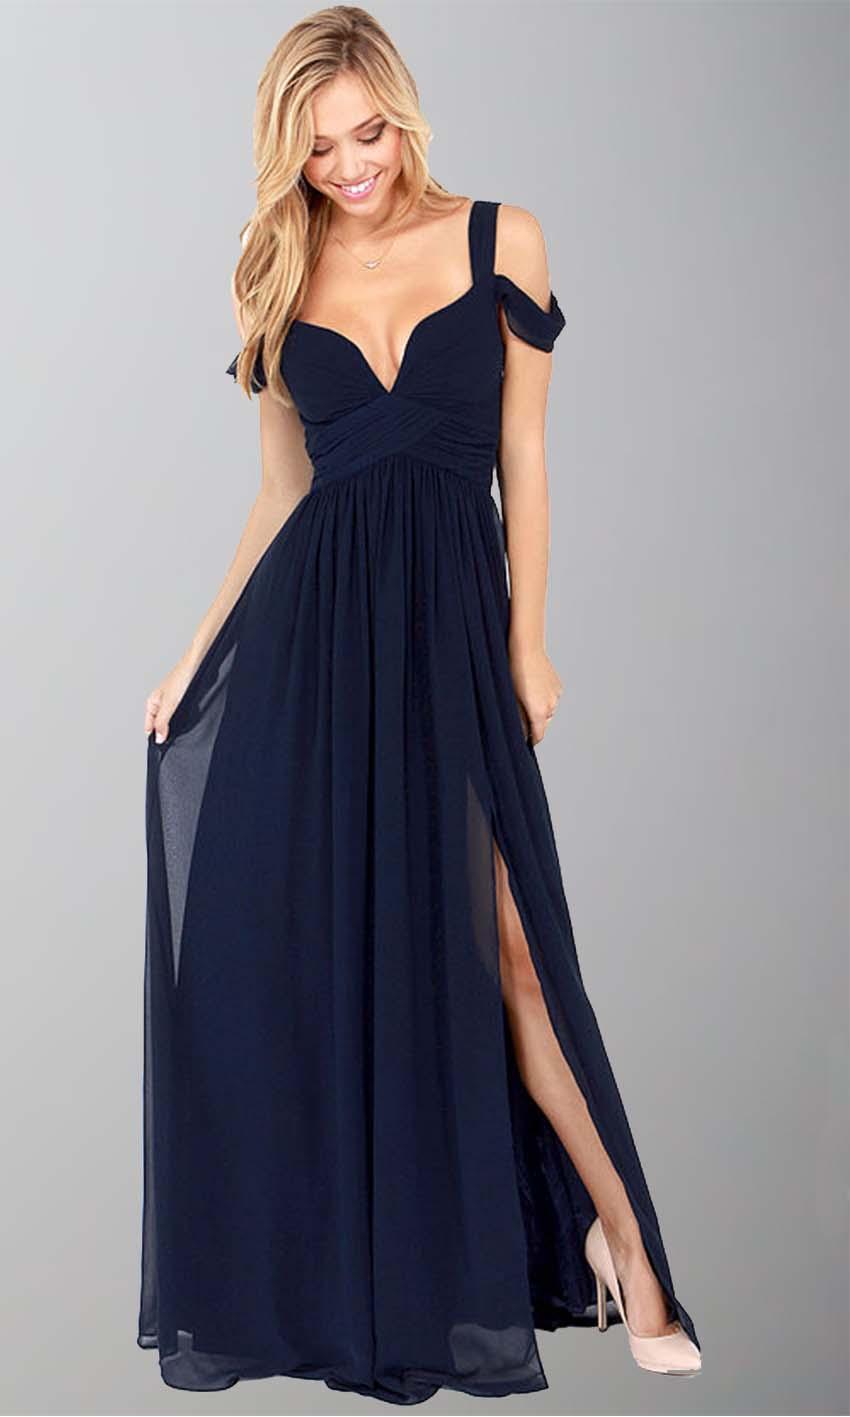 Yazenia - Rhinestoned Lace Halter Empire Chiffon Wedding Dress